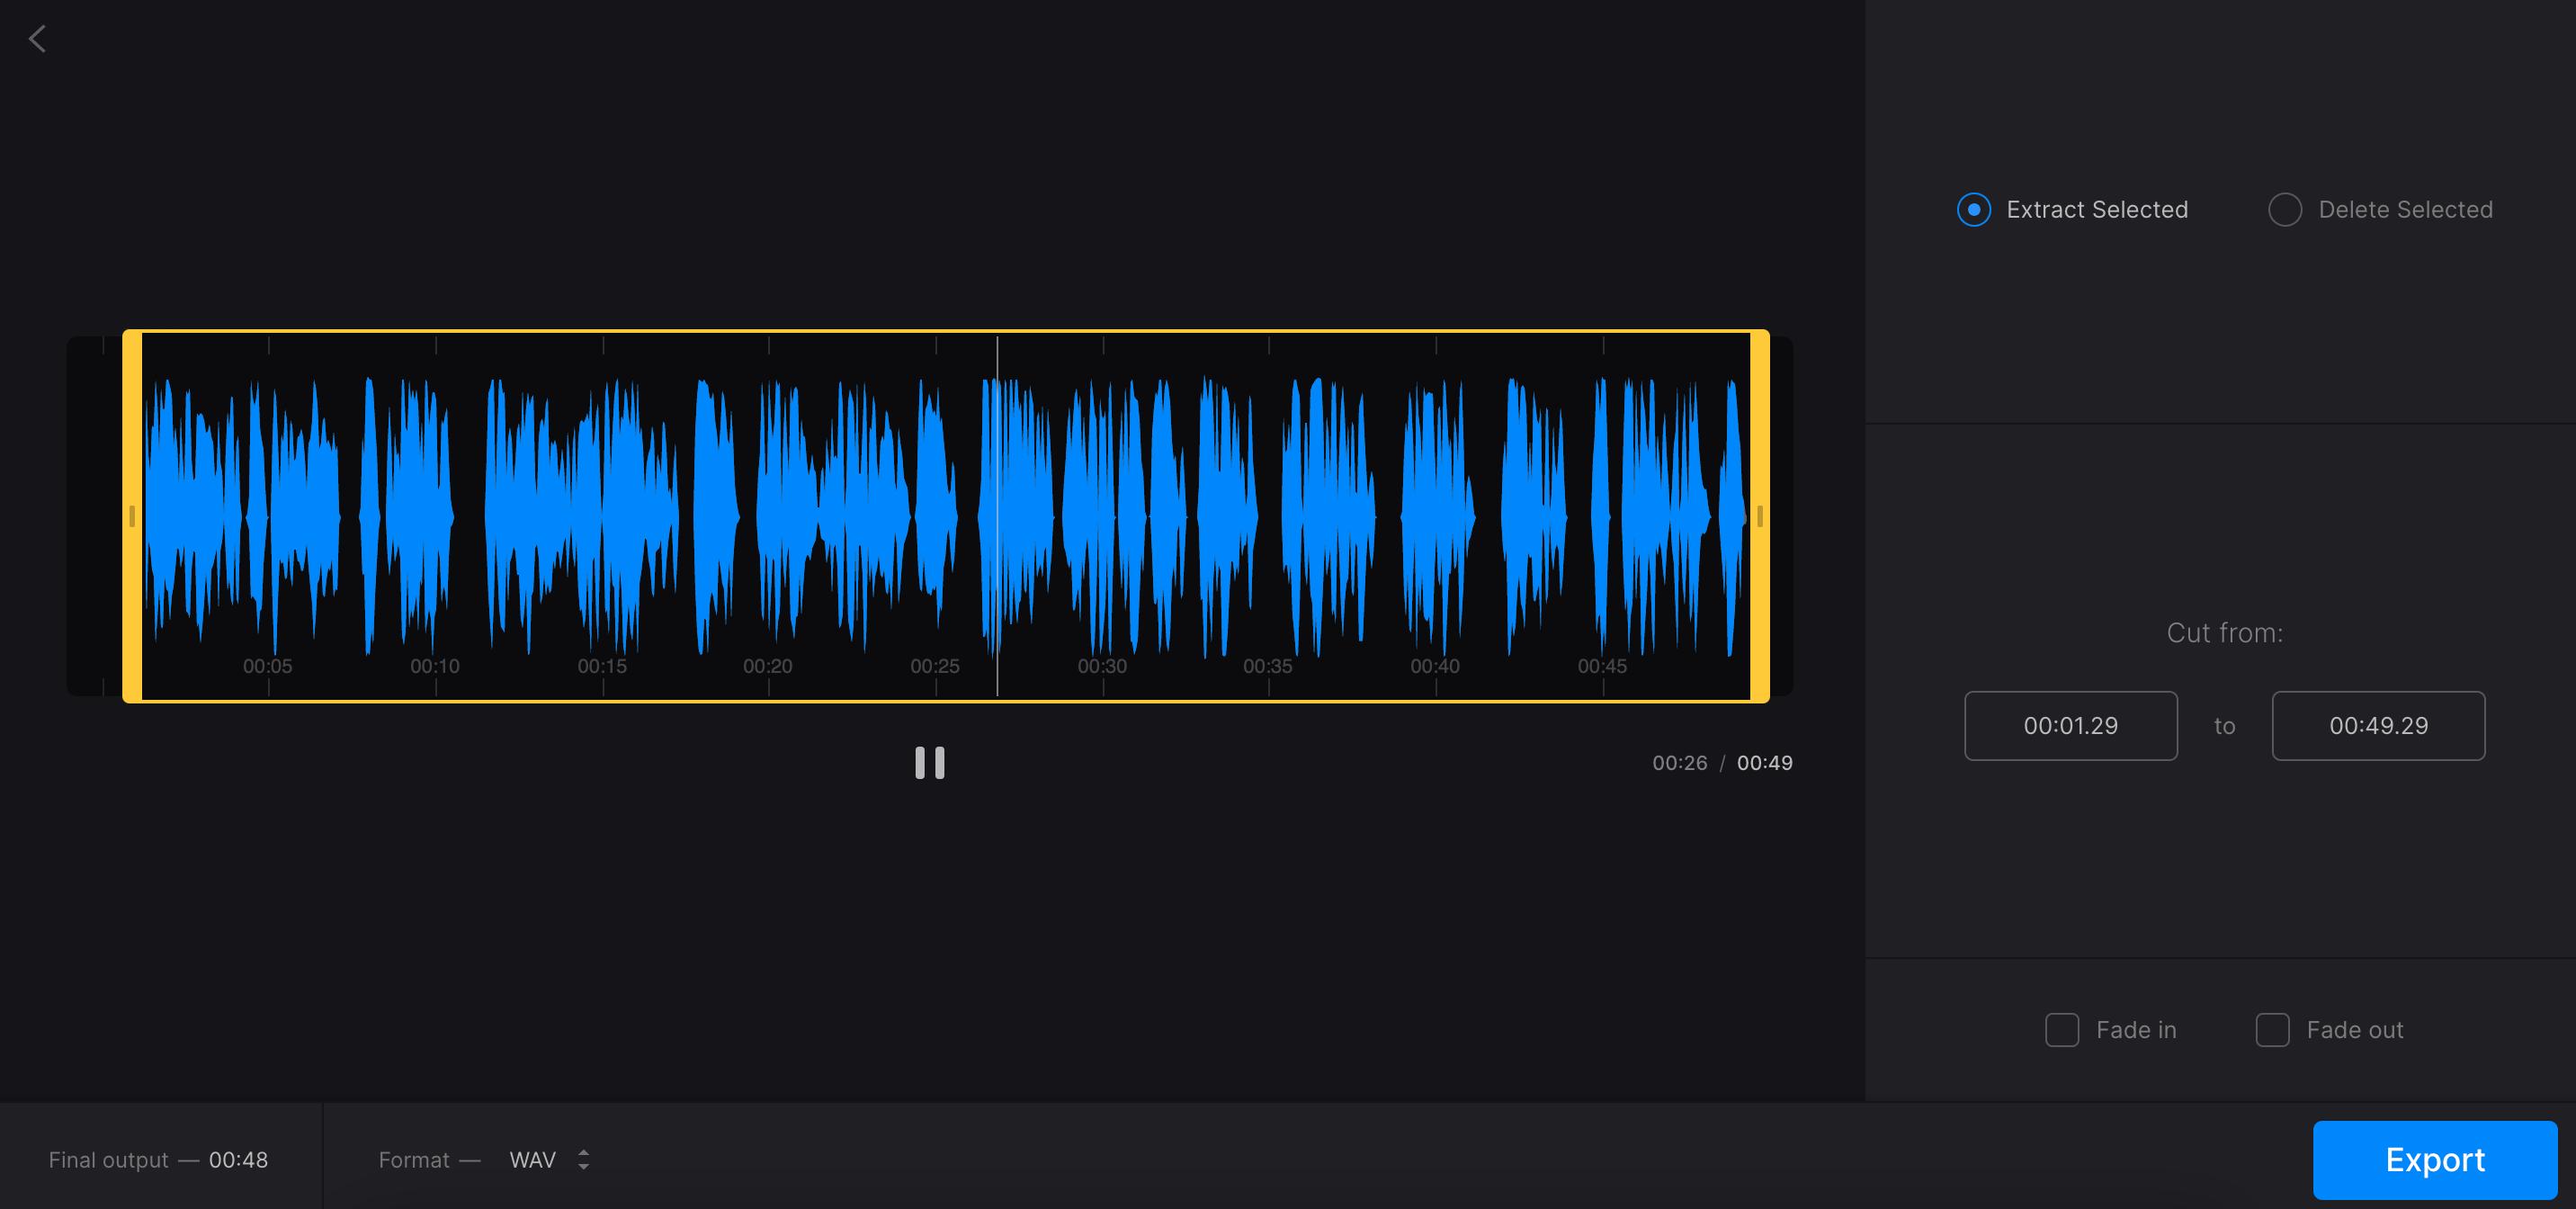 Adjust Soundcloud song to download